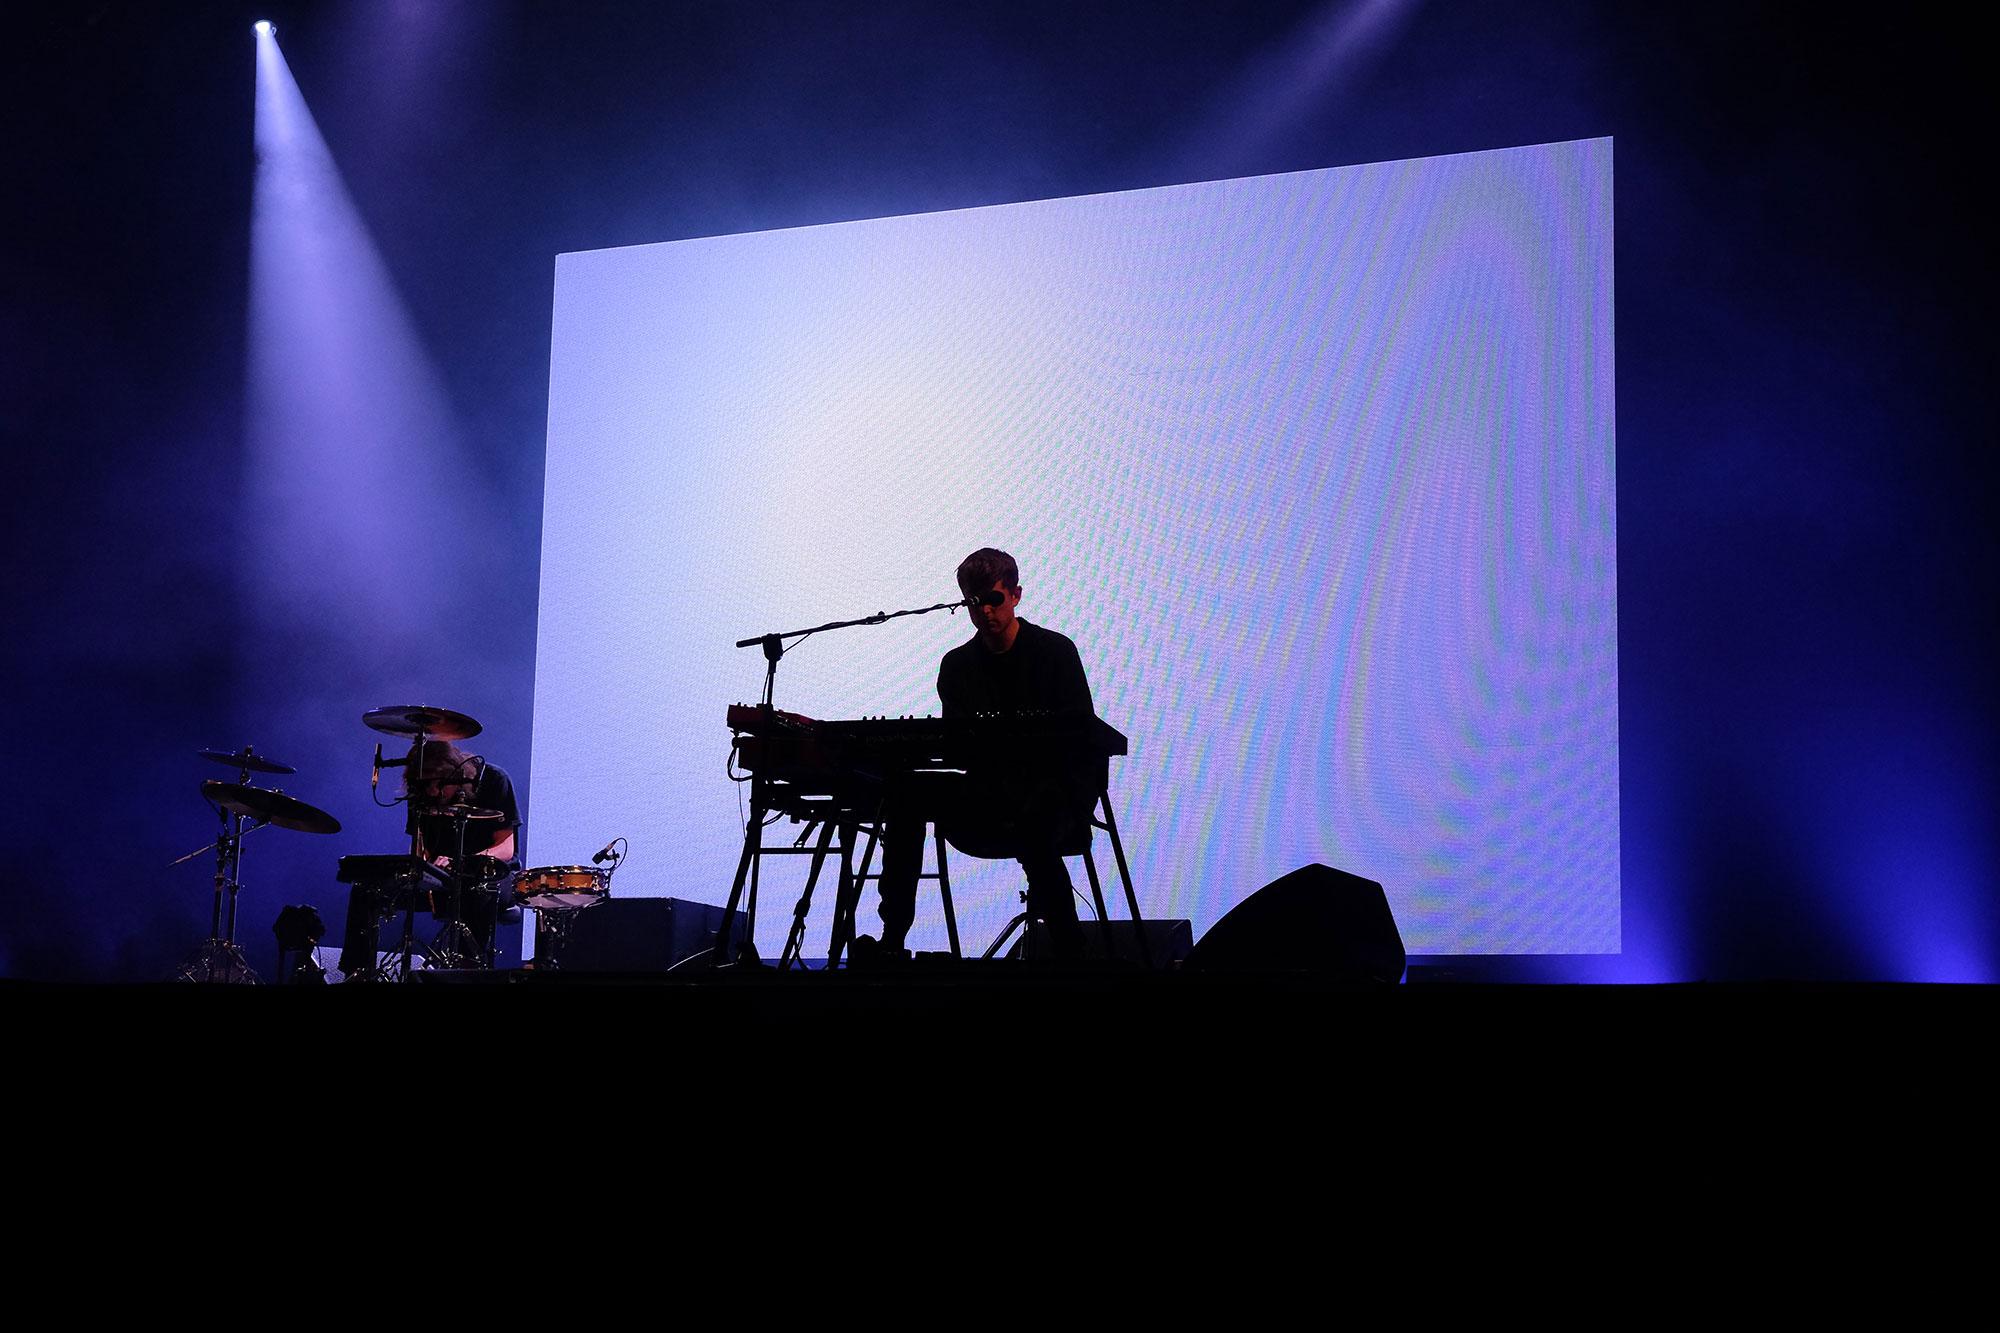 James Blake at Glastonbury Festival, 2016